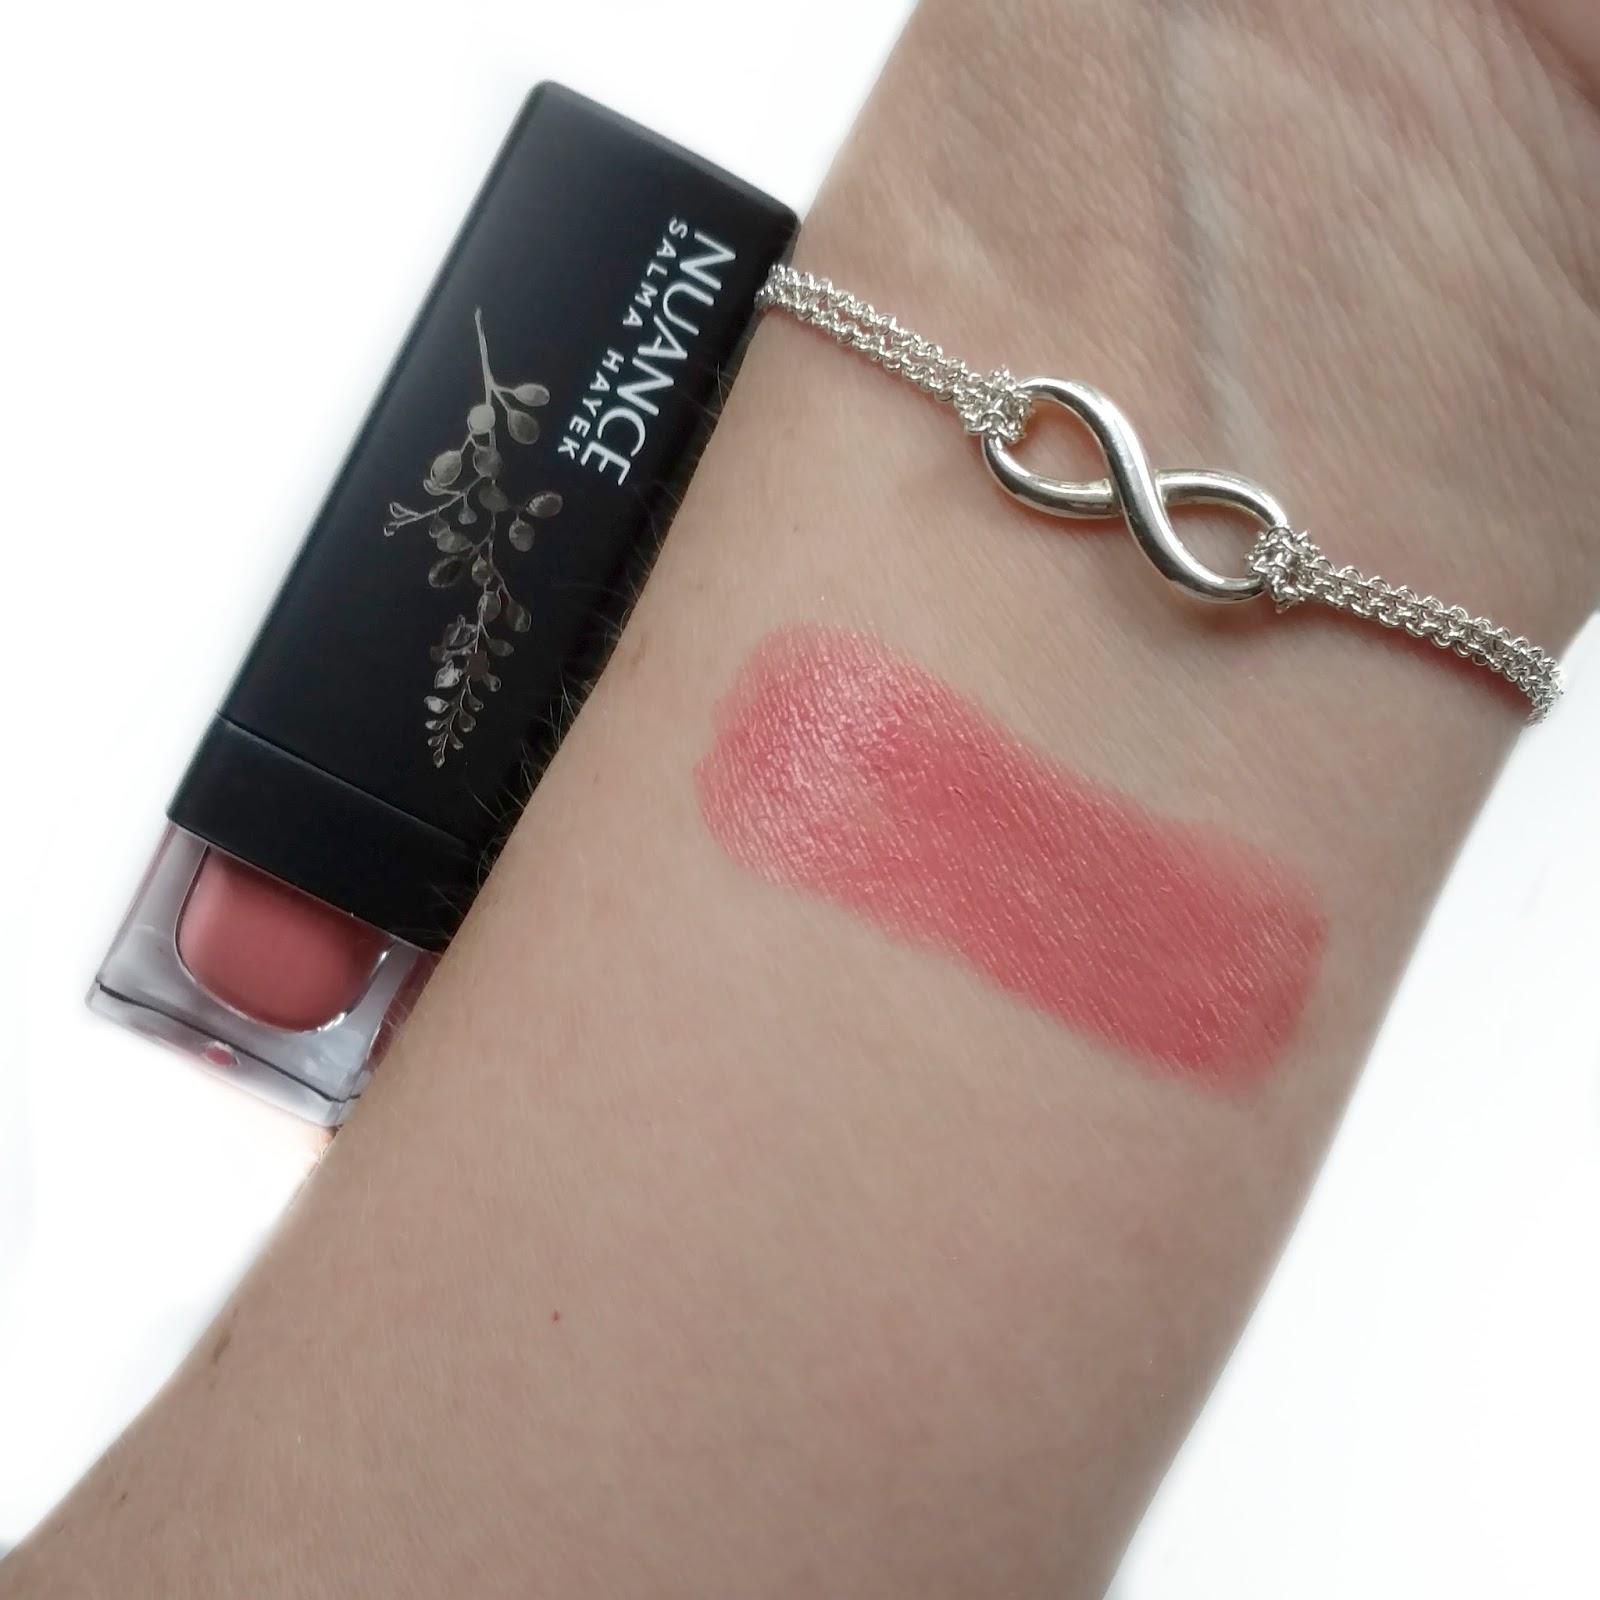 nuance salma hayek lipstick swatches